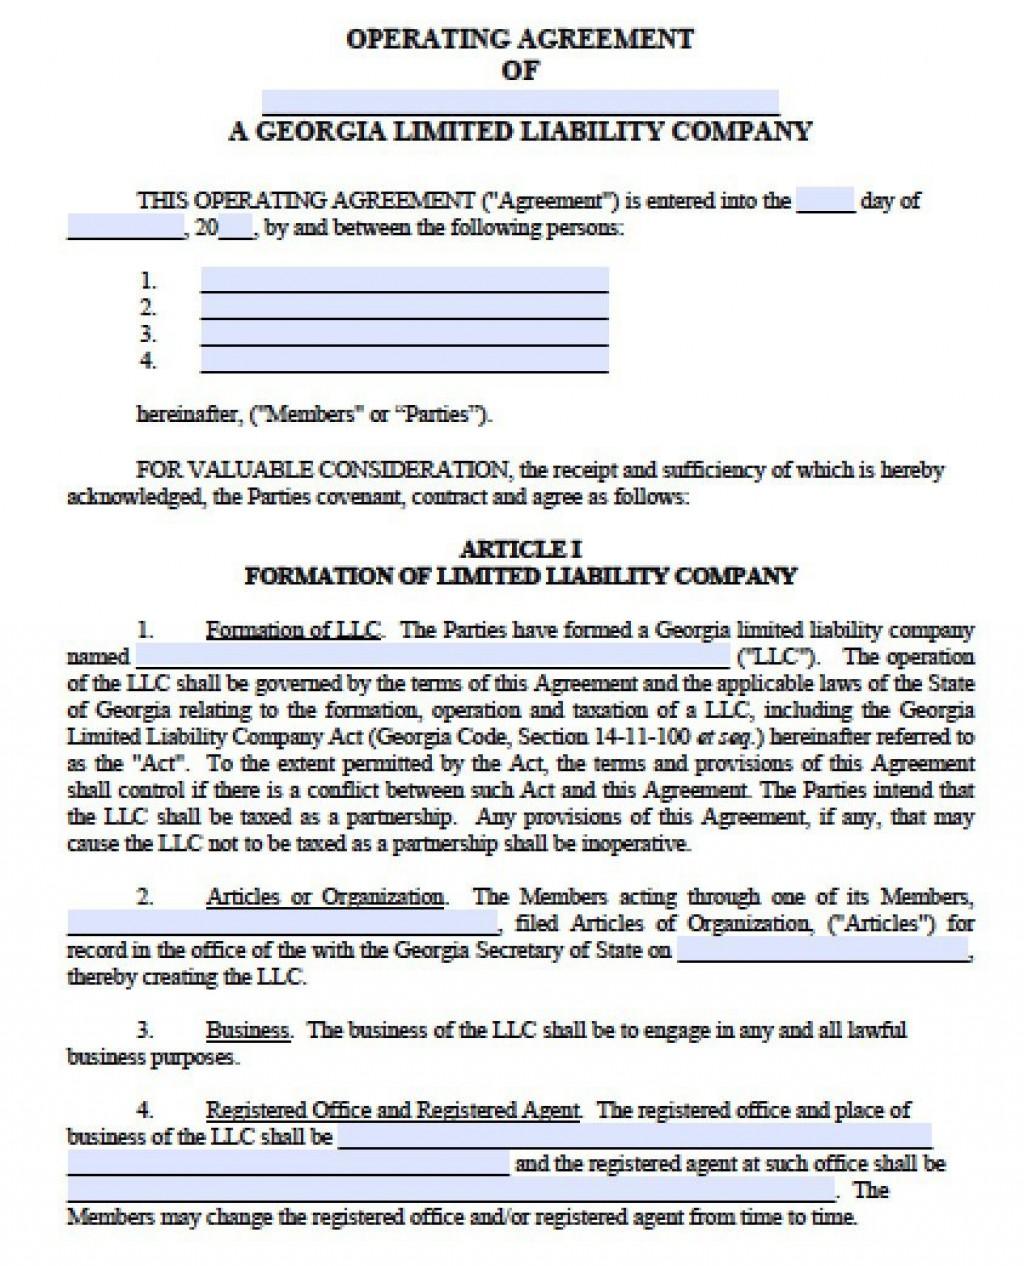 003 Impressive Operating Agreement Template For Llc Inspiration  Form Florida TexaLarge